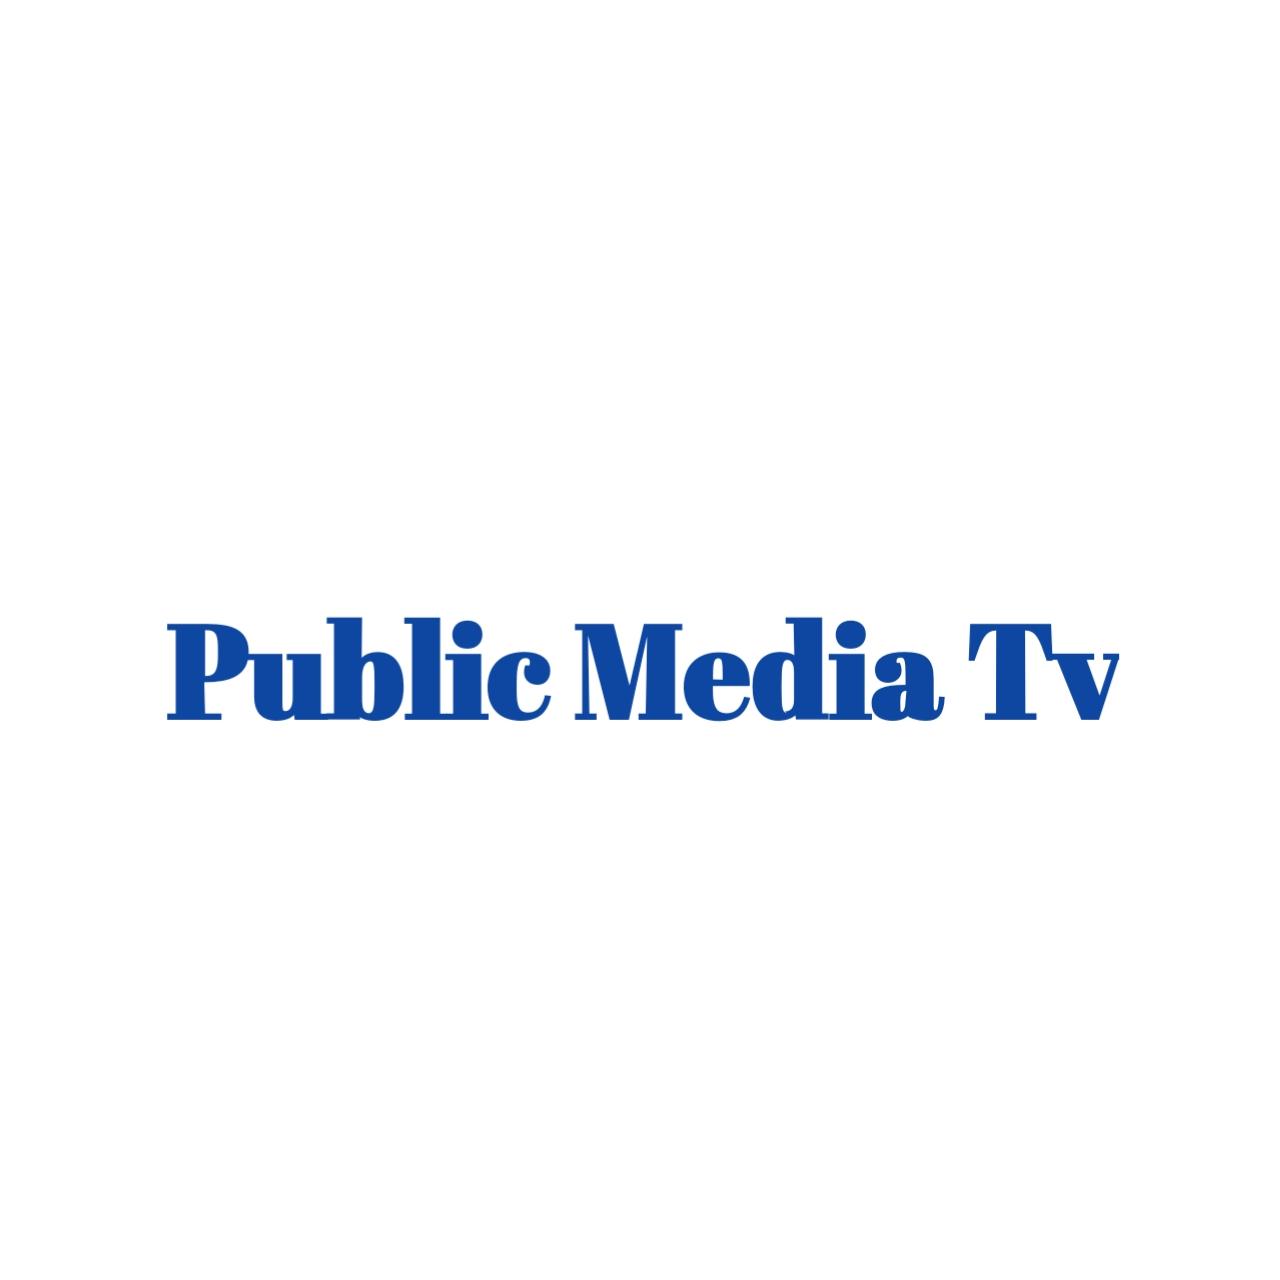 Public Media Tv